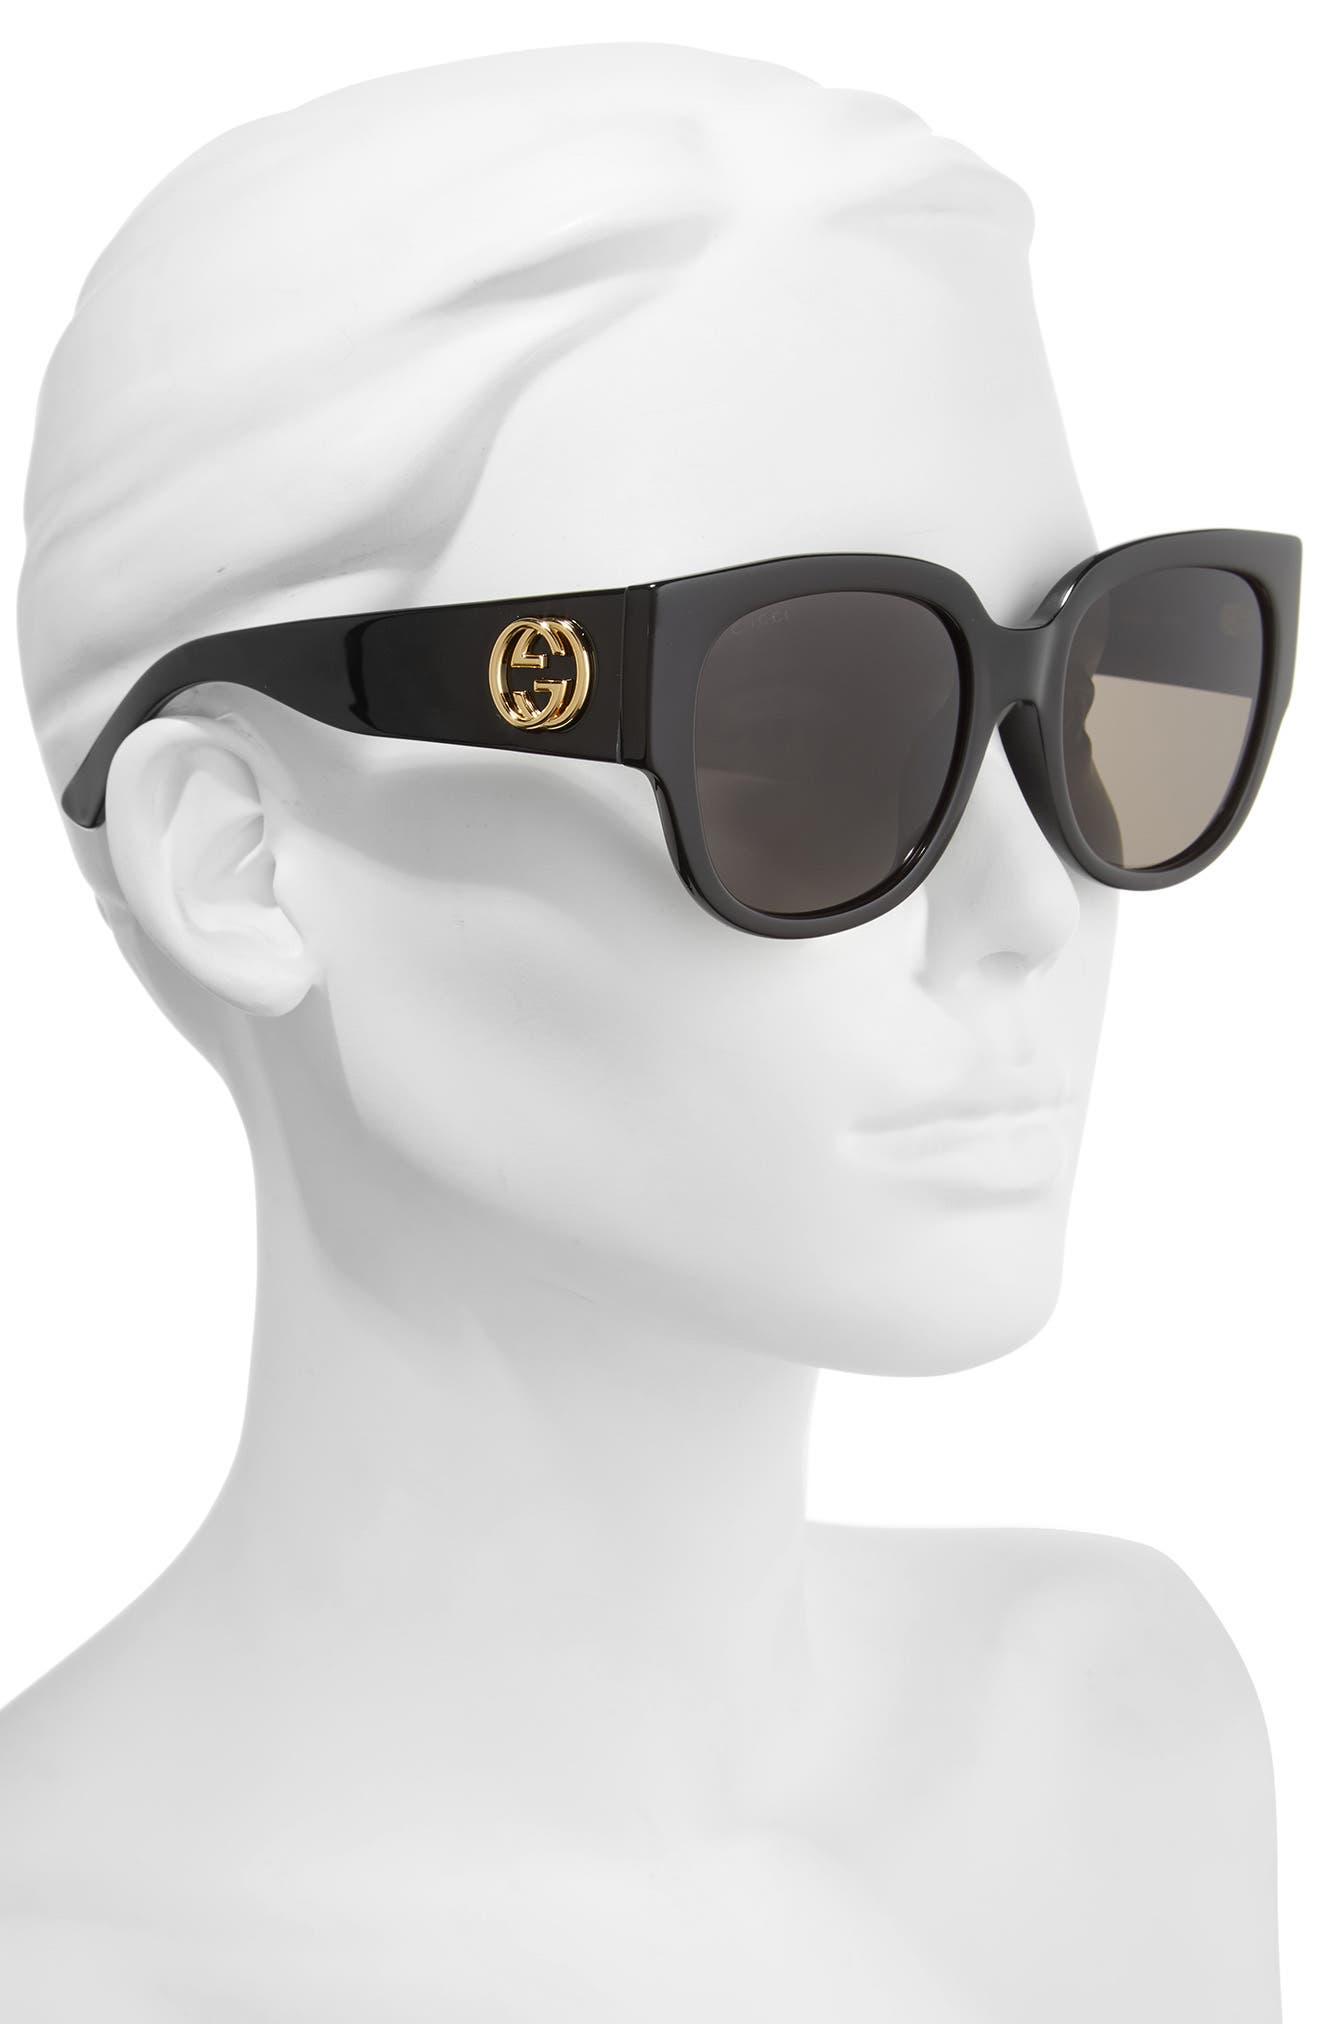 55mm Square Cat Eye Sunglasses,                             Alternate thumbnail 2, color,                             BLACK/ GREY